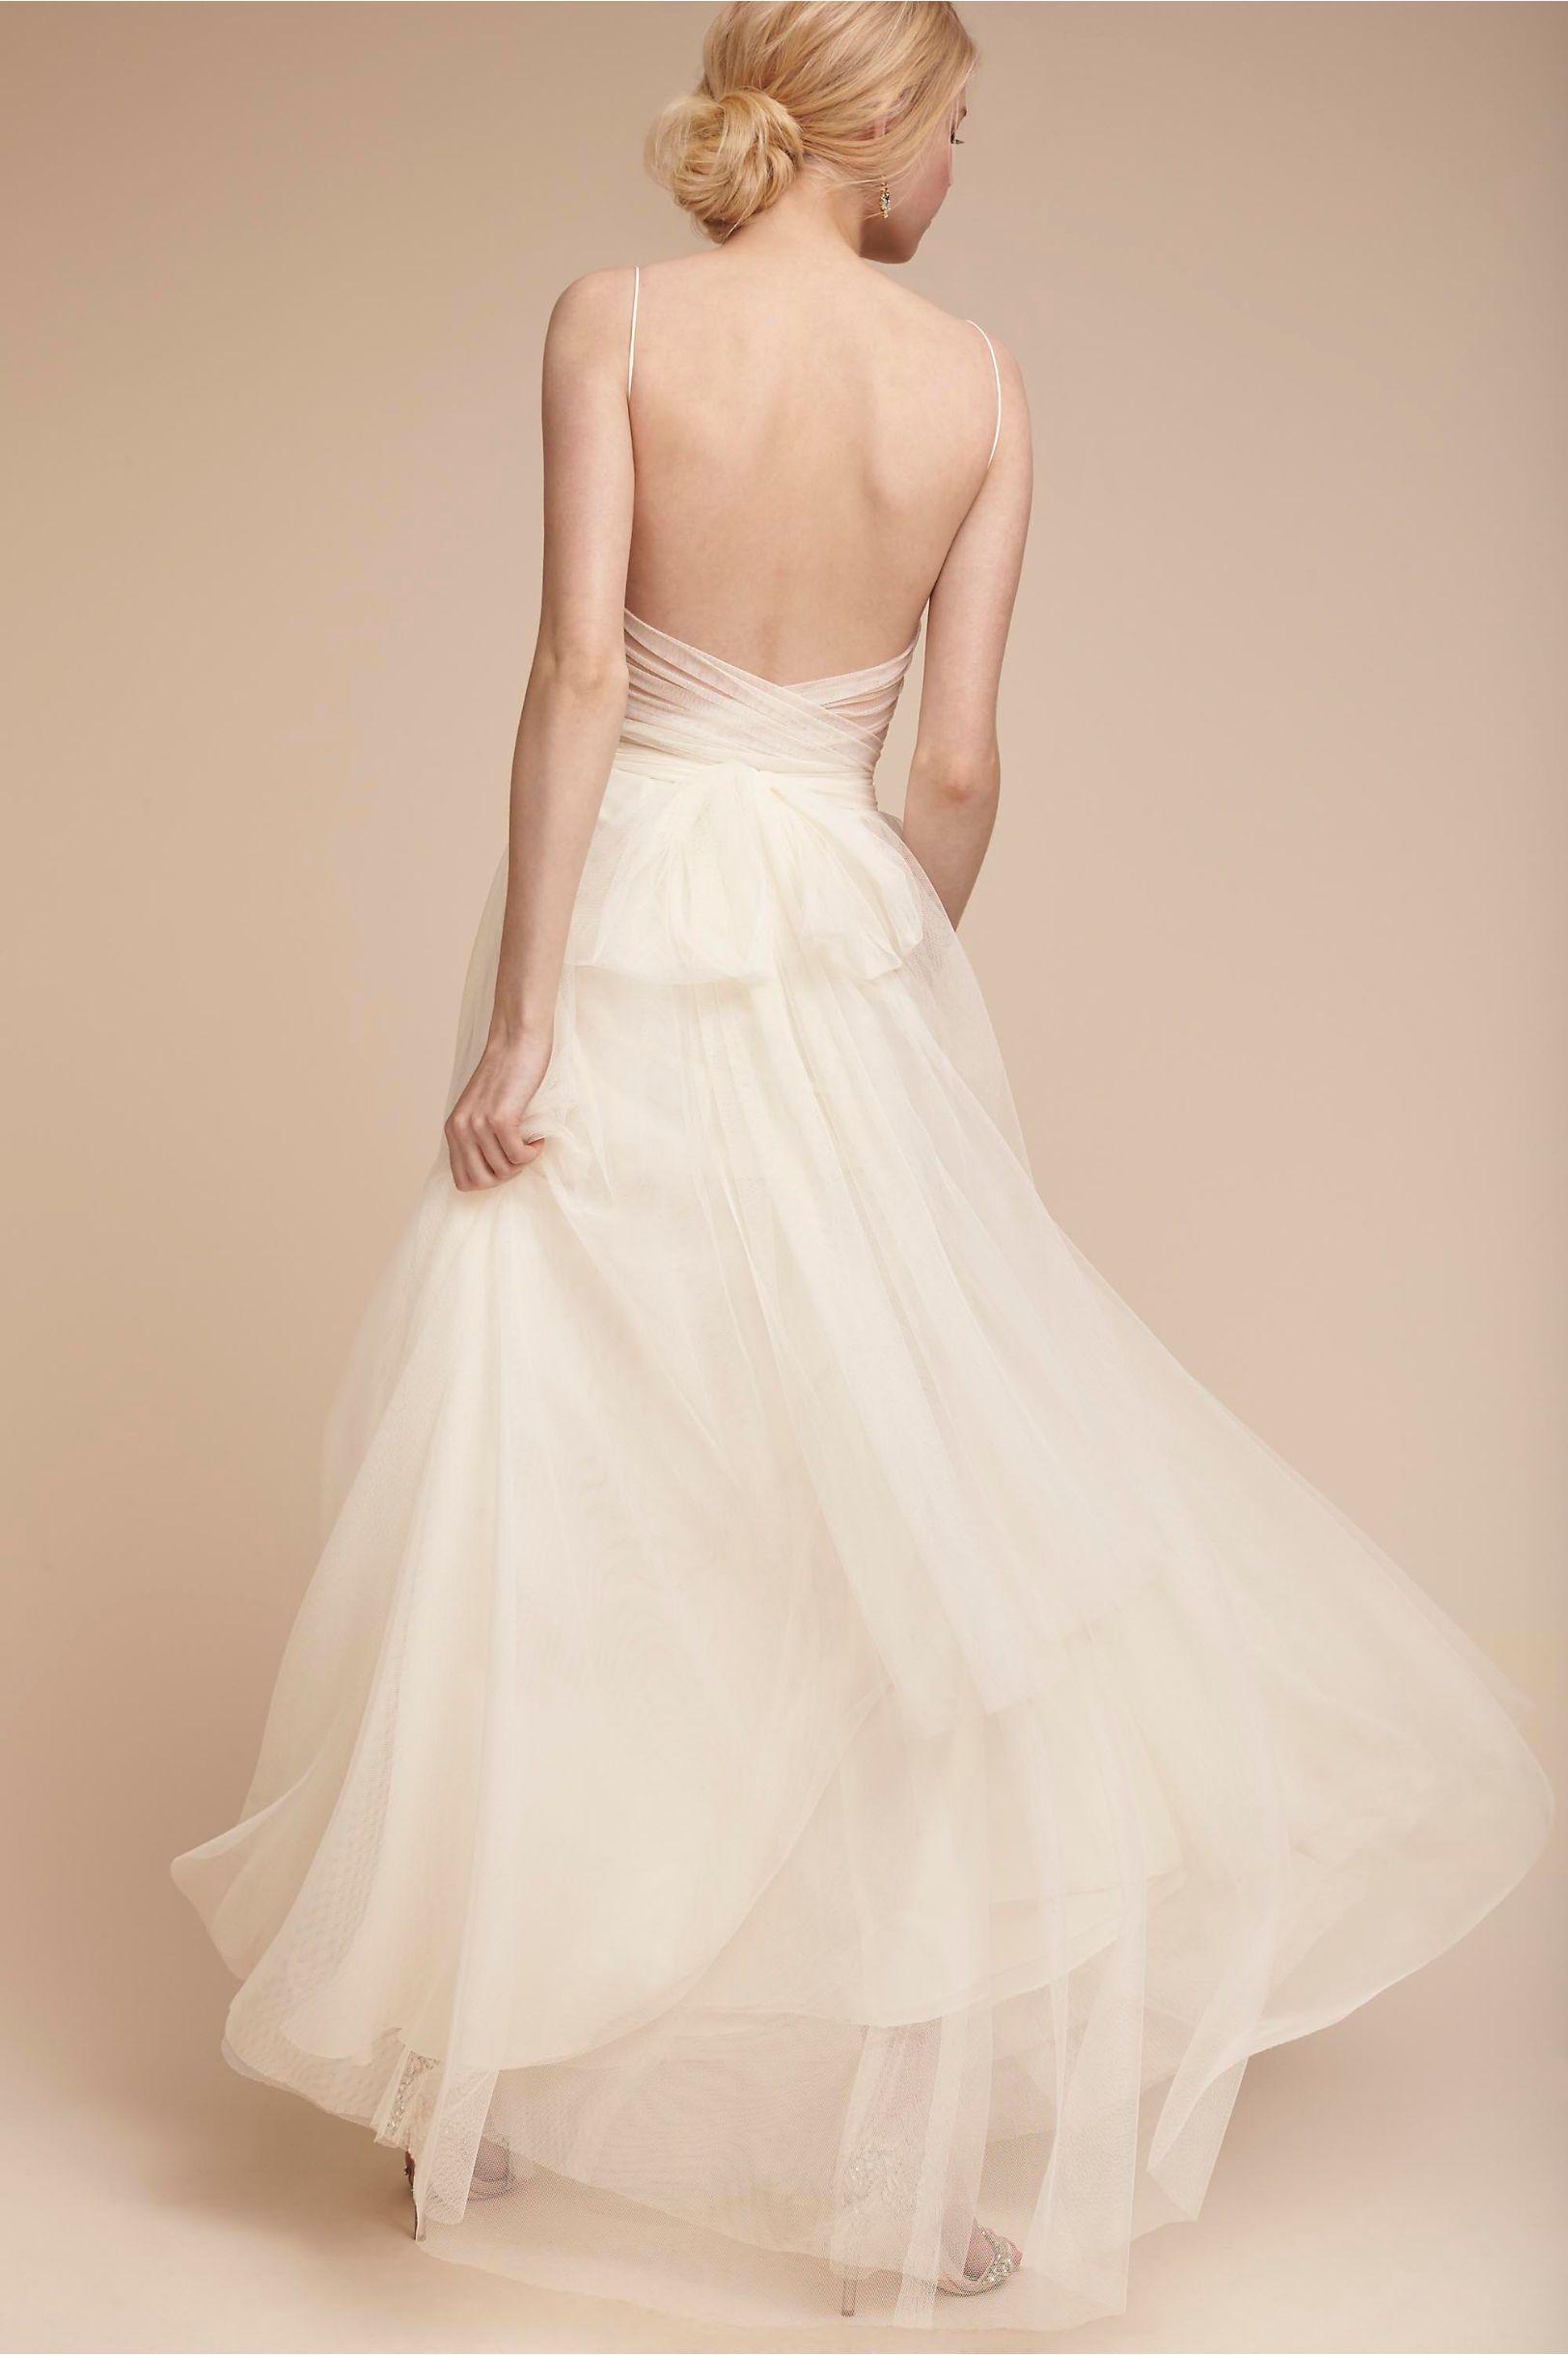 BHLDN Tinsley Dress in Bride Reception & Rehearsal Dresses   BHLDN ...